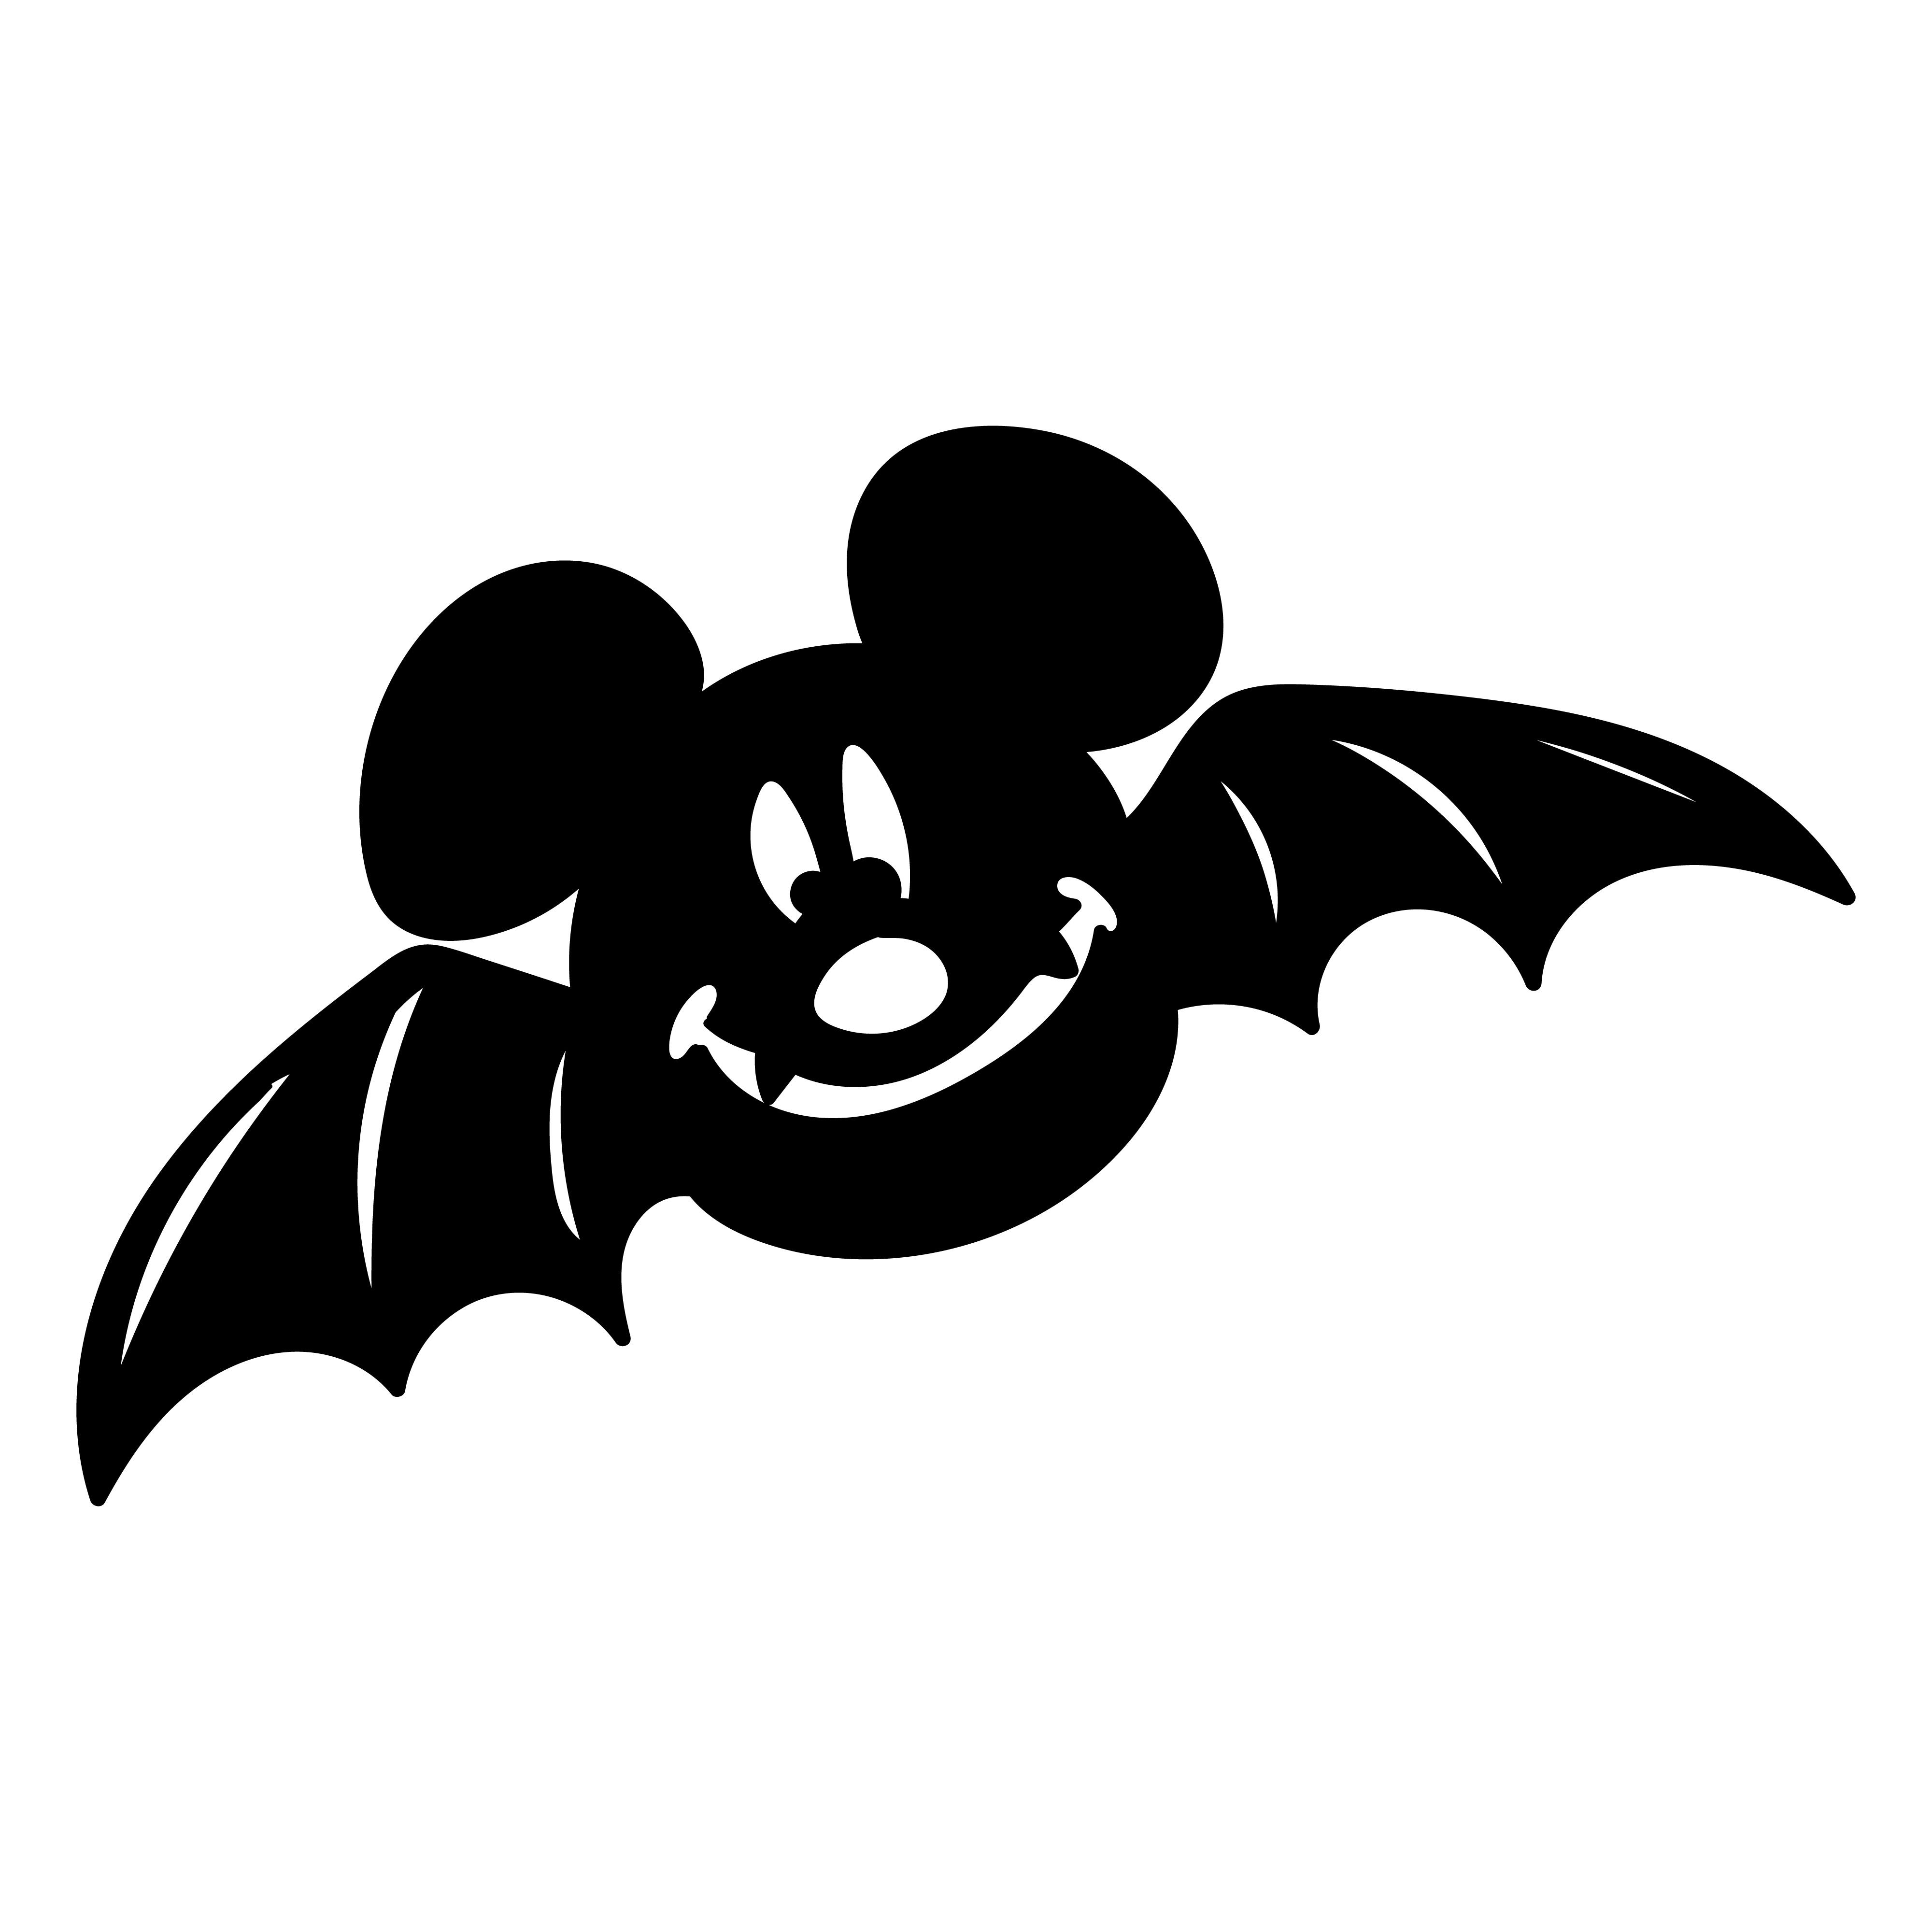 Disney Halloween Pumpkin Stencils  Printable